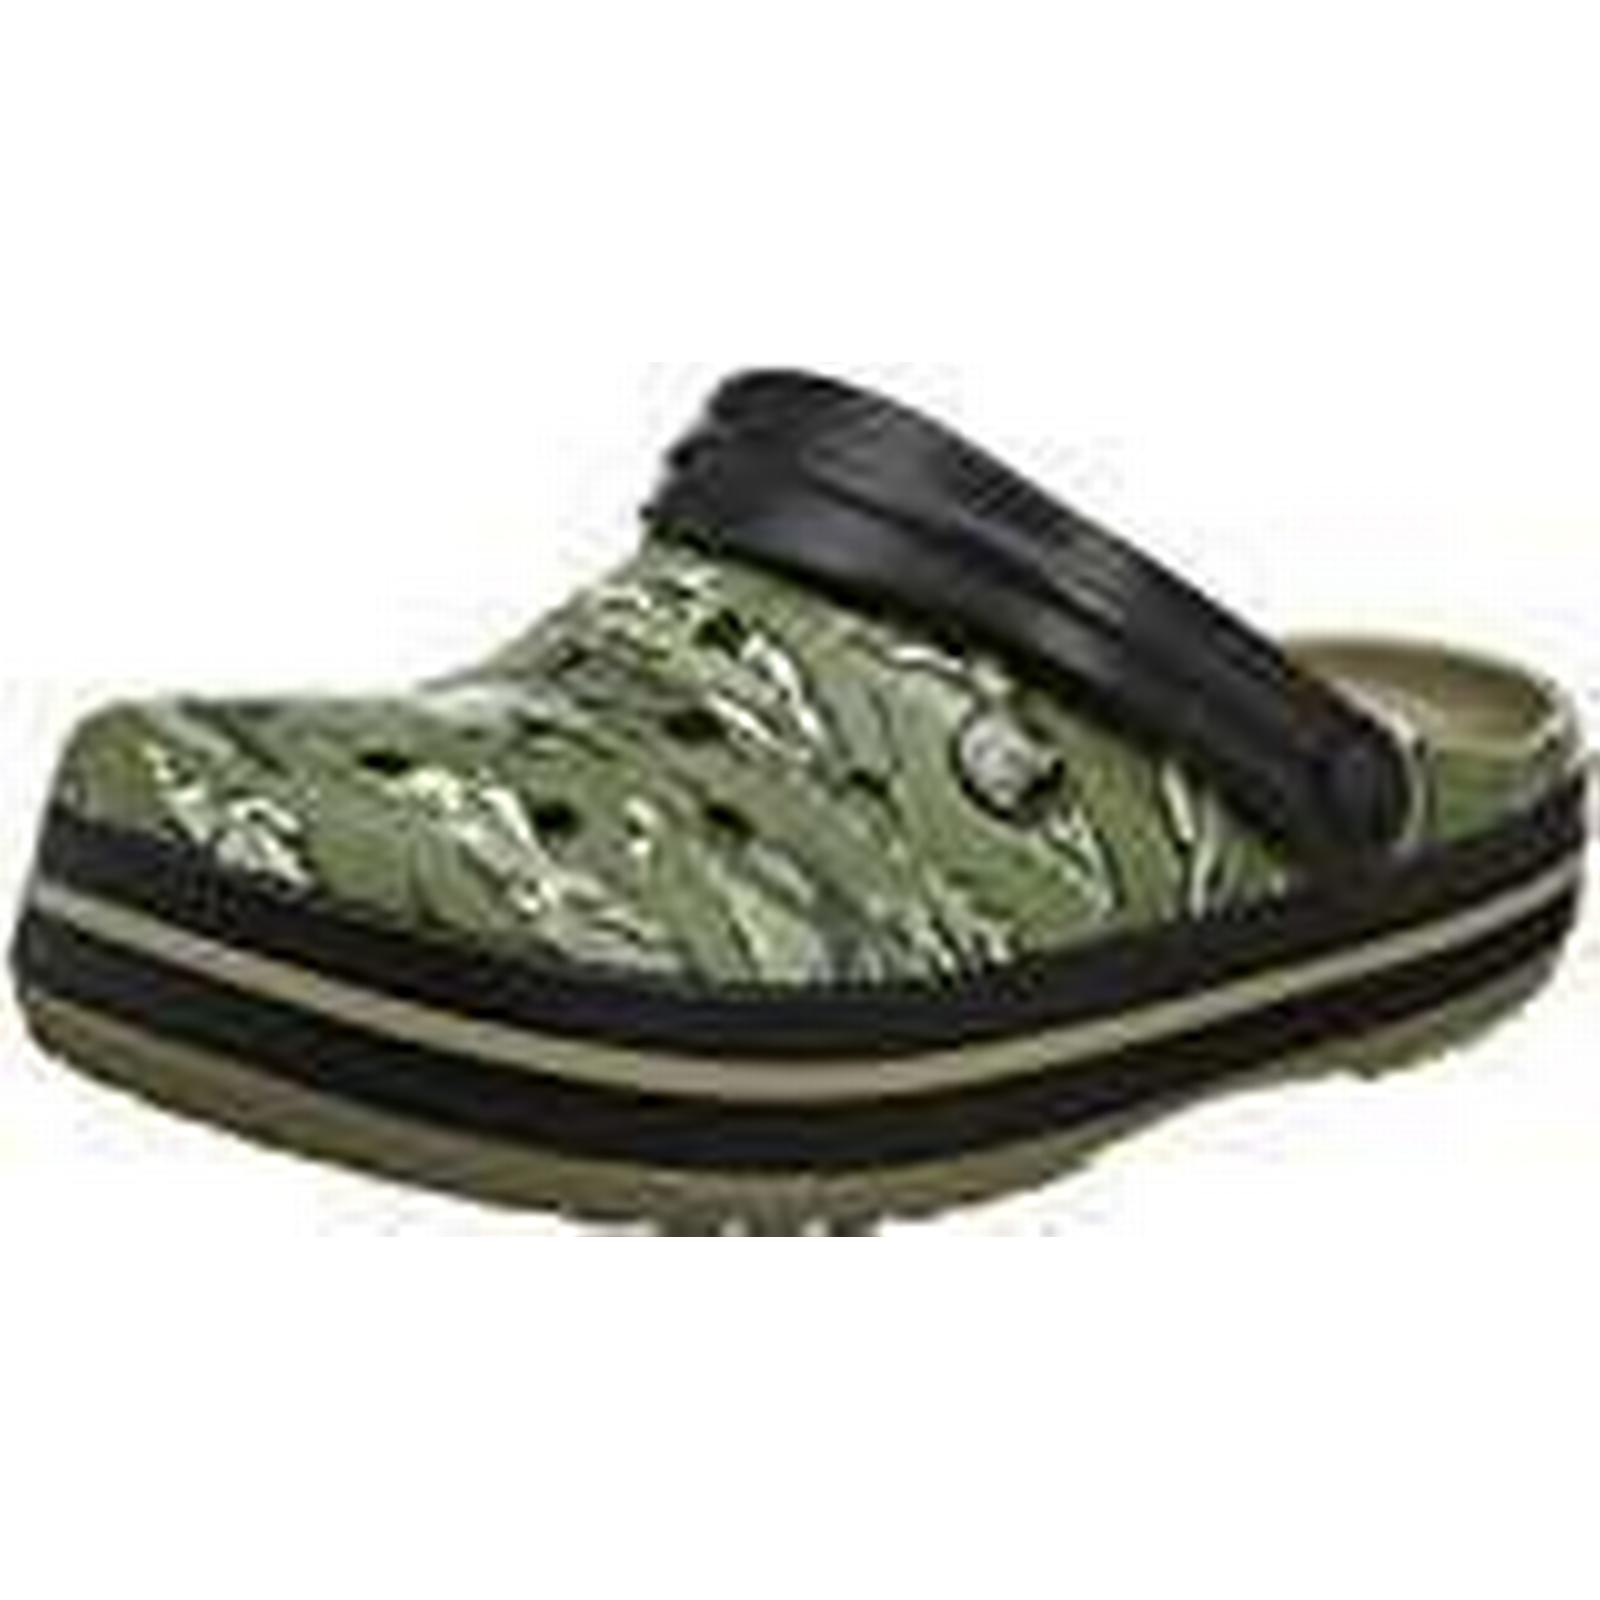 Crocs Camo Crocband Graphic verde), Clog (Dark Camo Crocs verde), Graphic 9 UK 8 UK   78e5c1